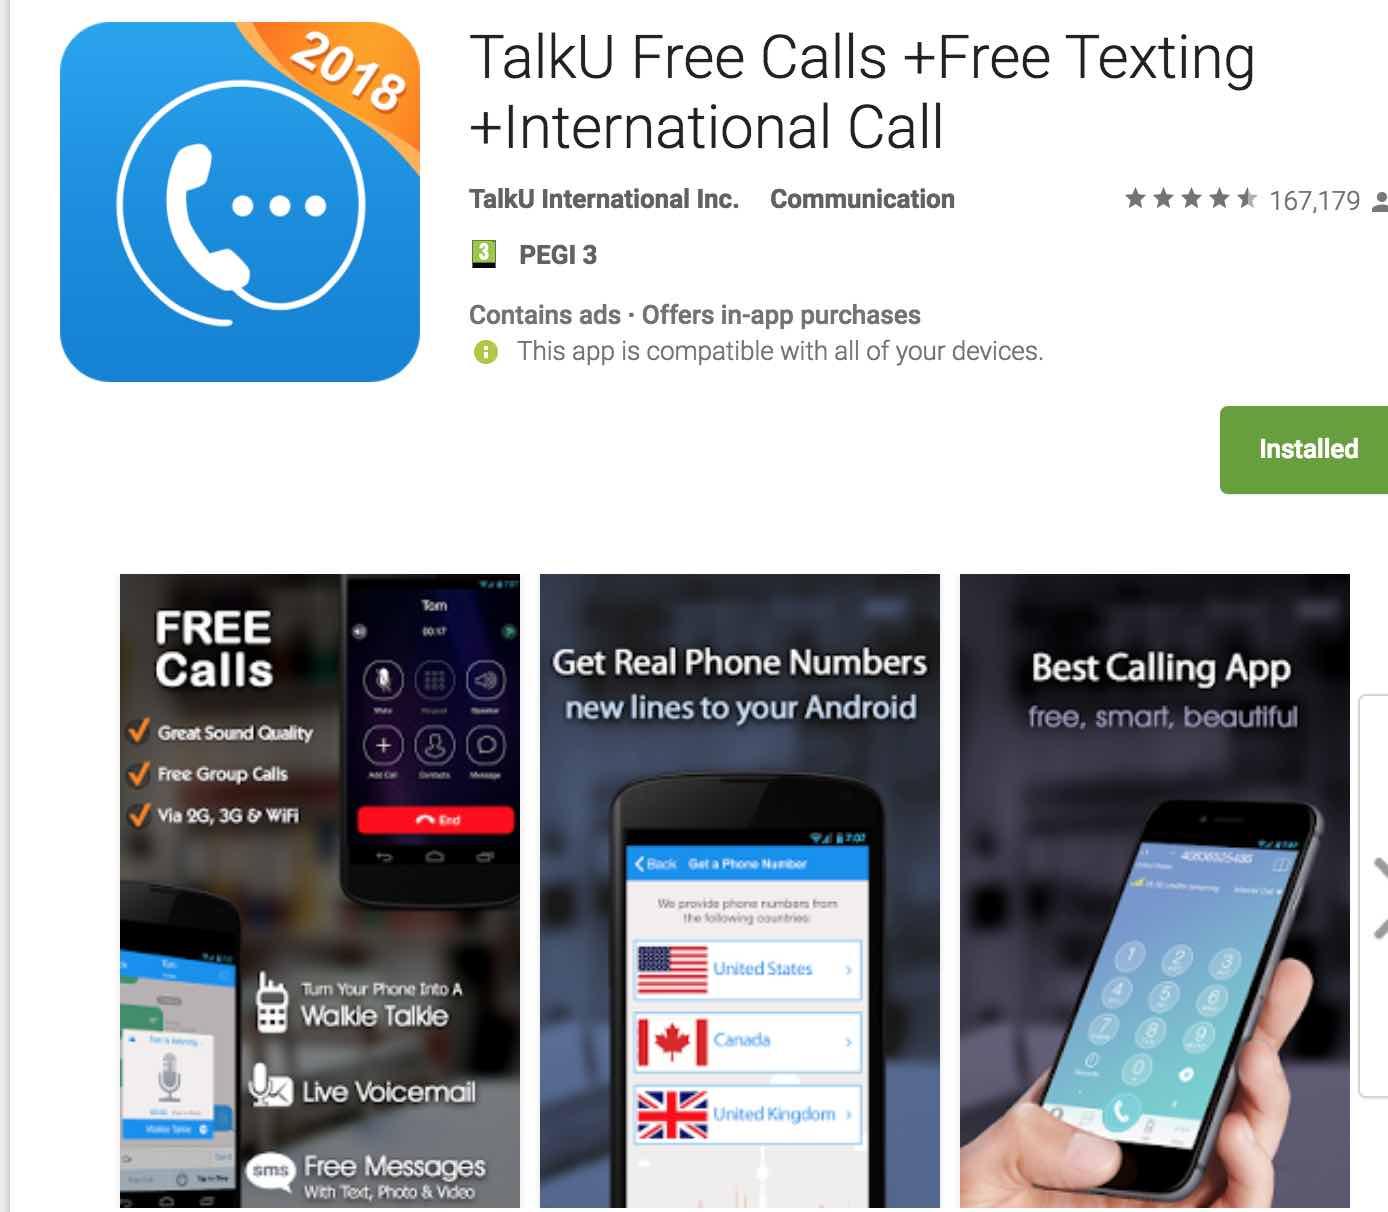 Talku Free Calls Free Texting International Call Android